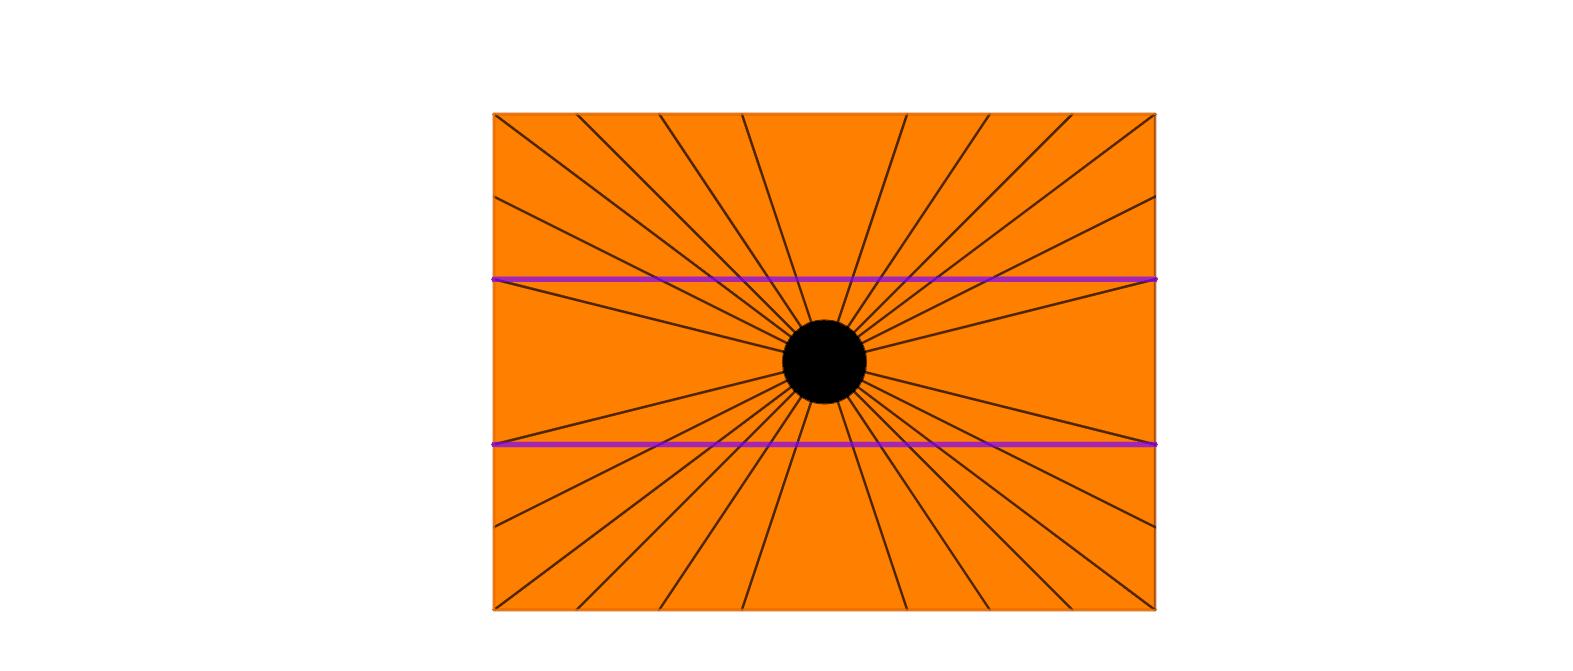 Linee curve o rette?